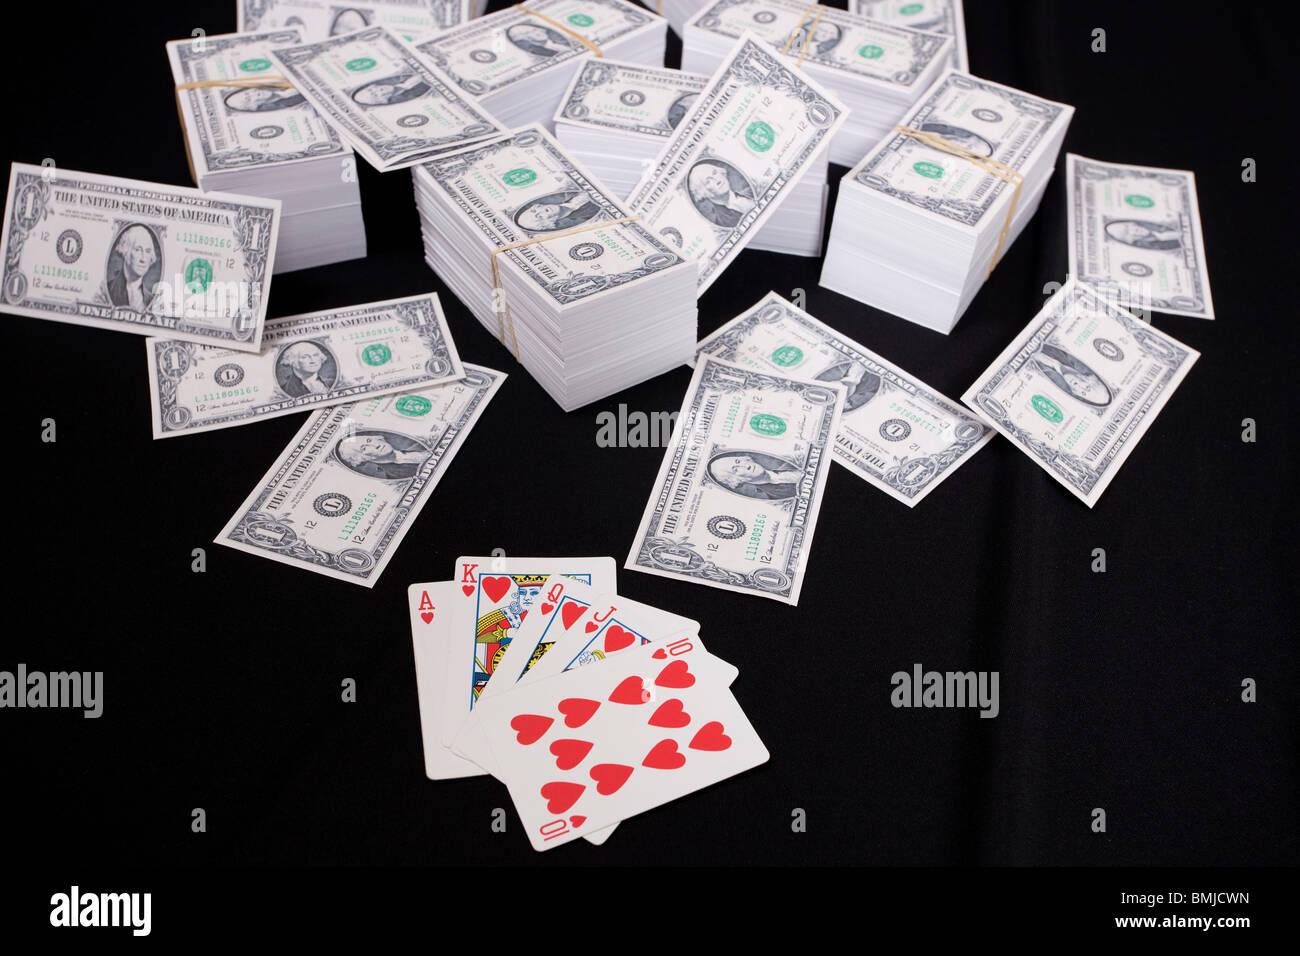 Montones de dinero y tarjetas Imagen De Stock